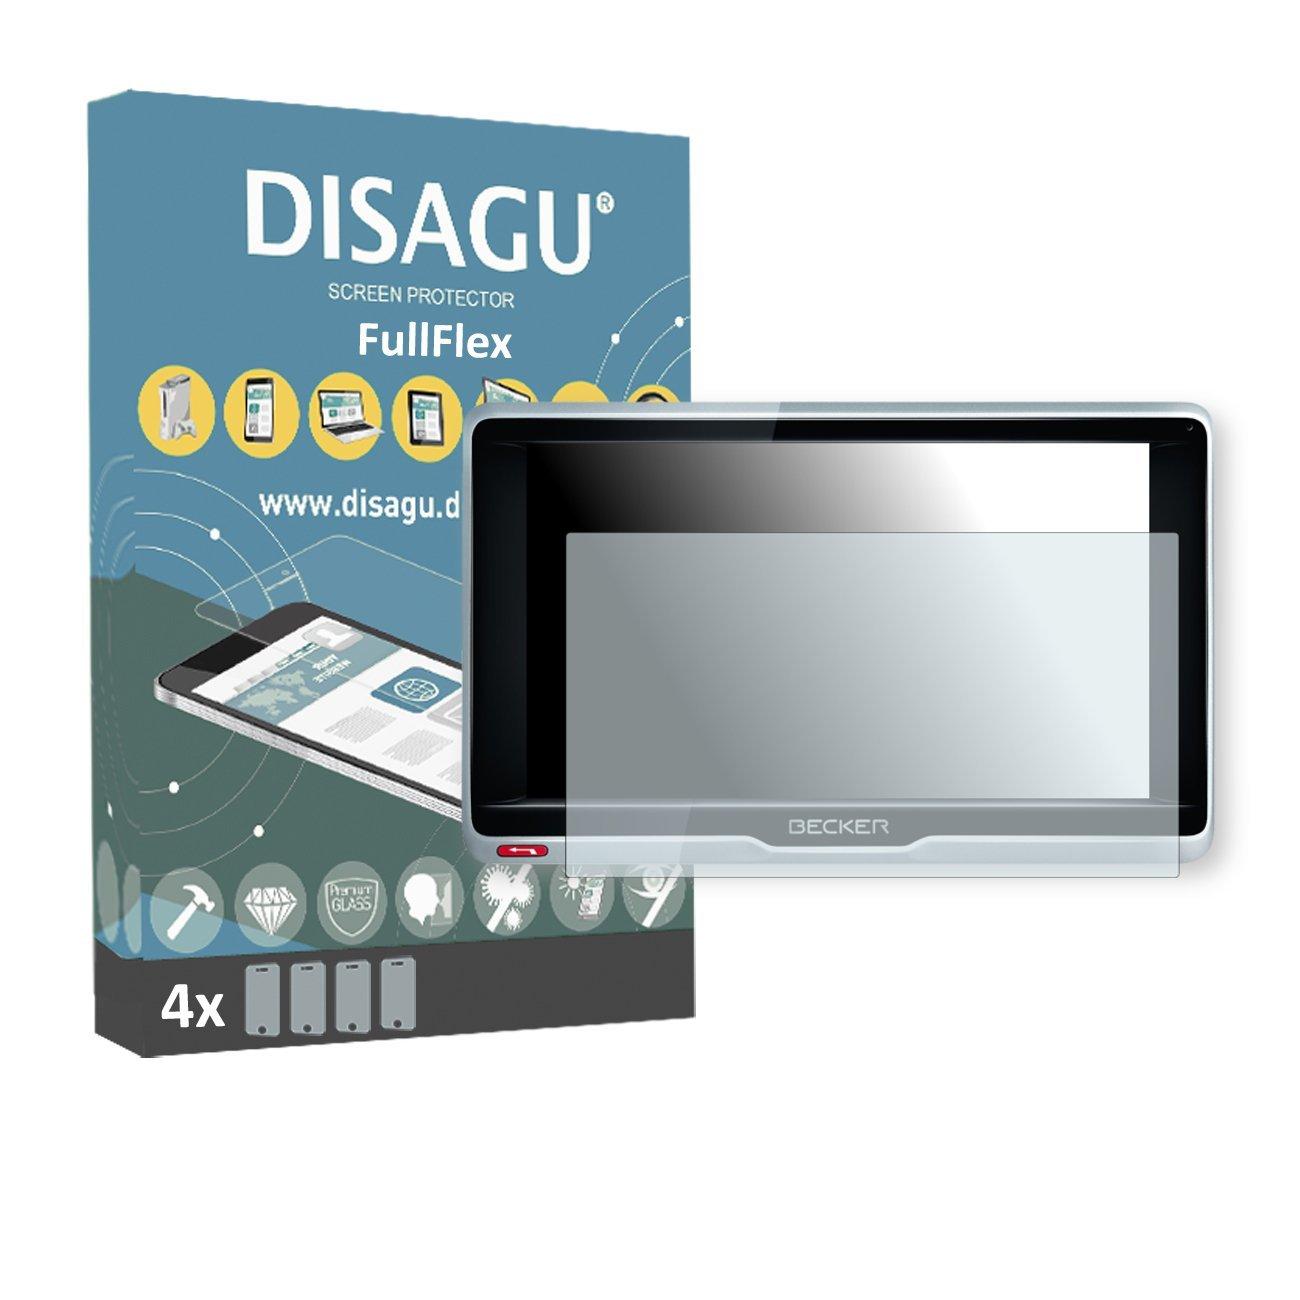 4 x Disagu FullFlex screen protector for Becker Professional.6 LMU foil screen protector